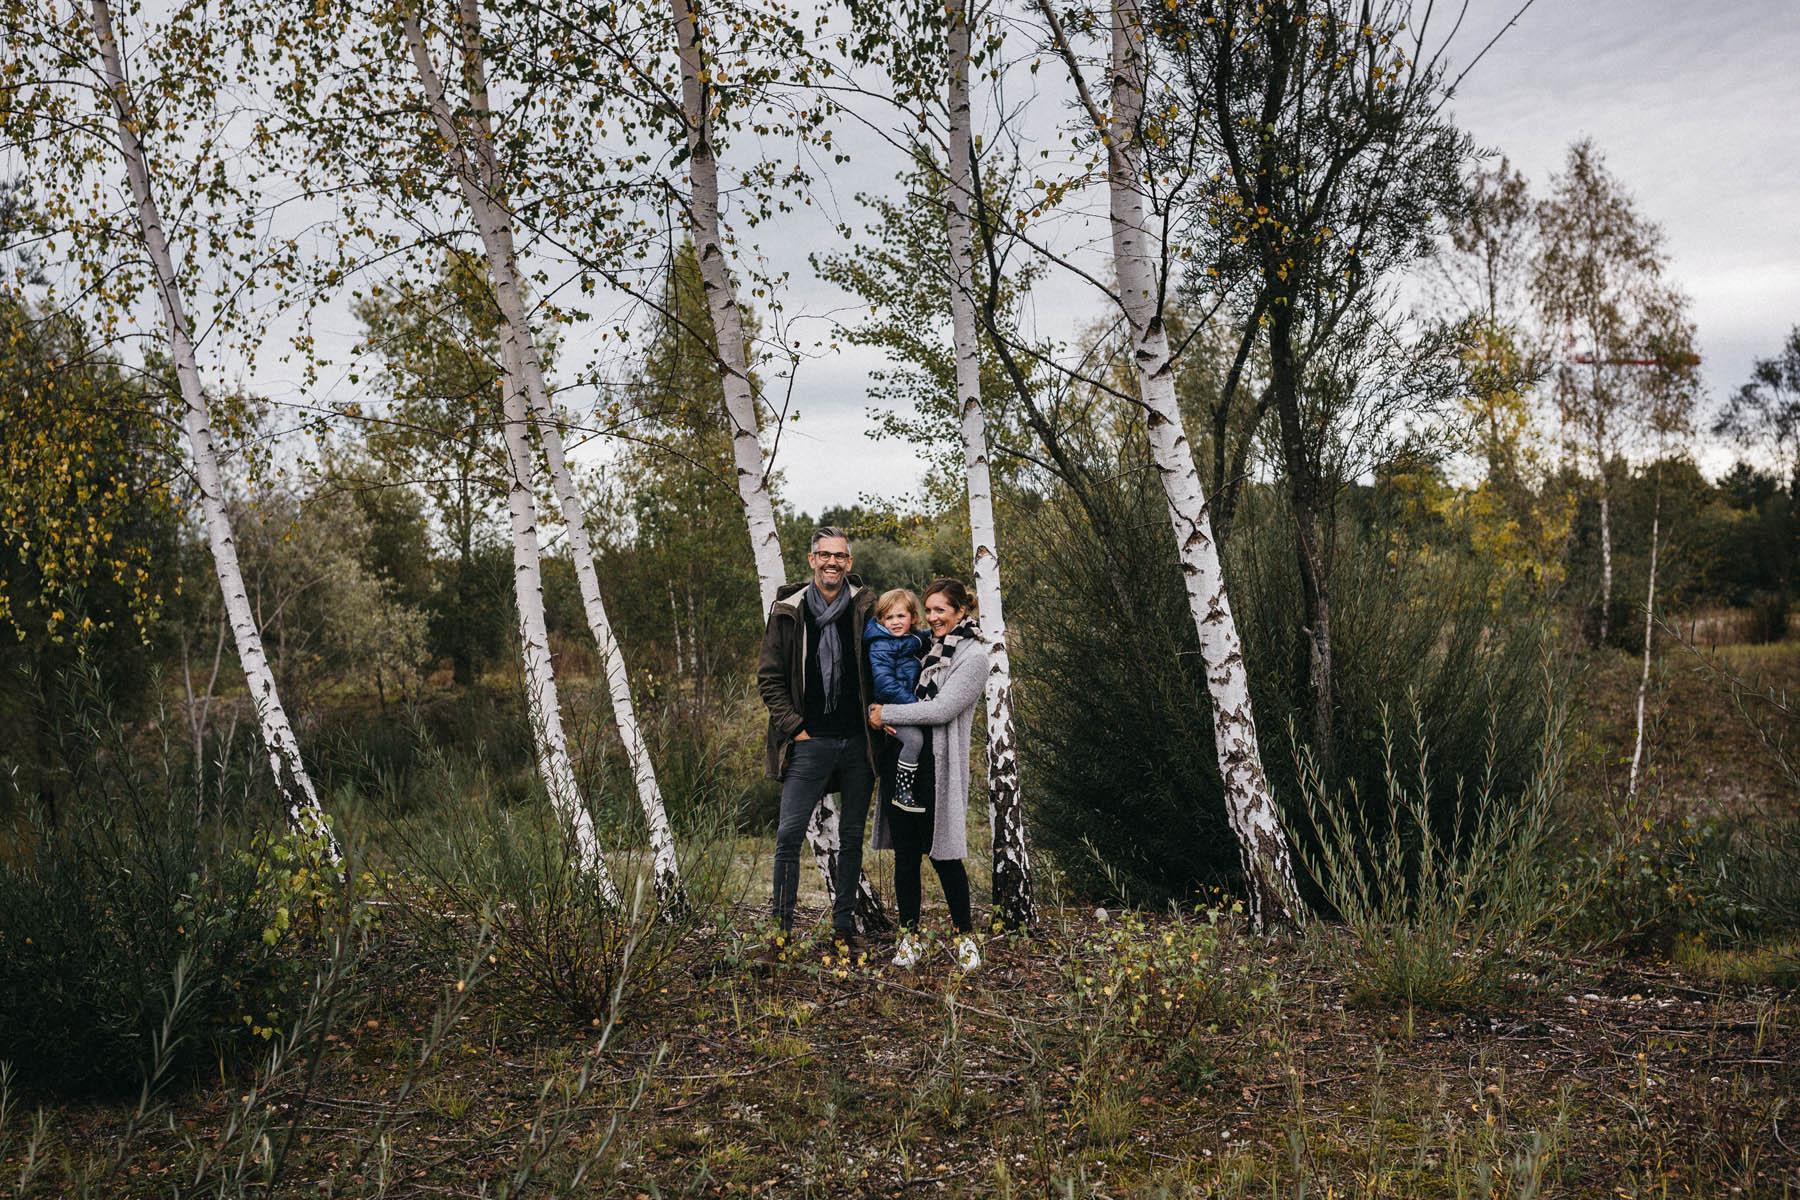 raissa simon fotografie familienfotos froettmaninger heide 016 - Annabel, Steffen + Cleo